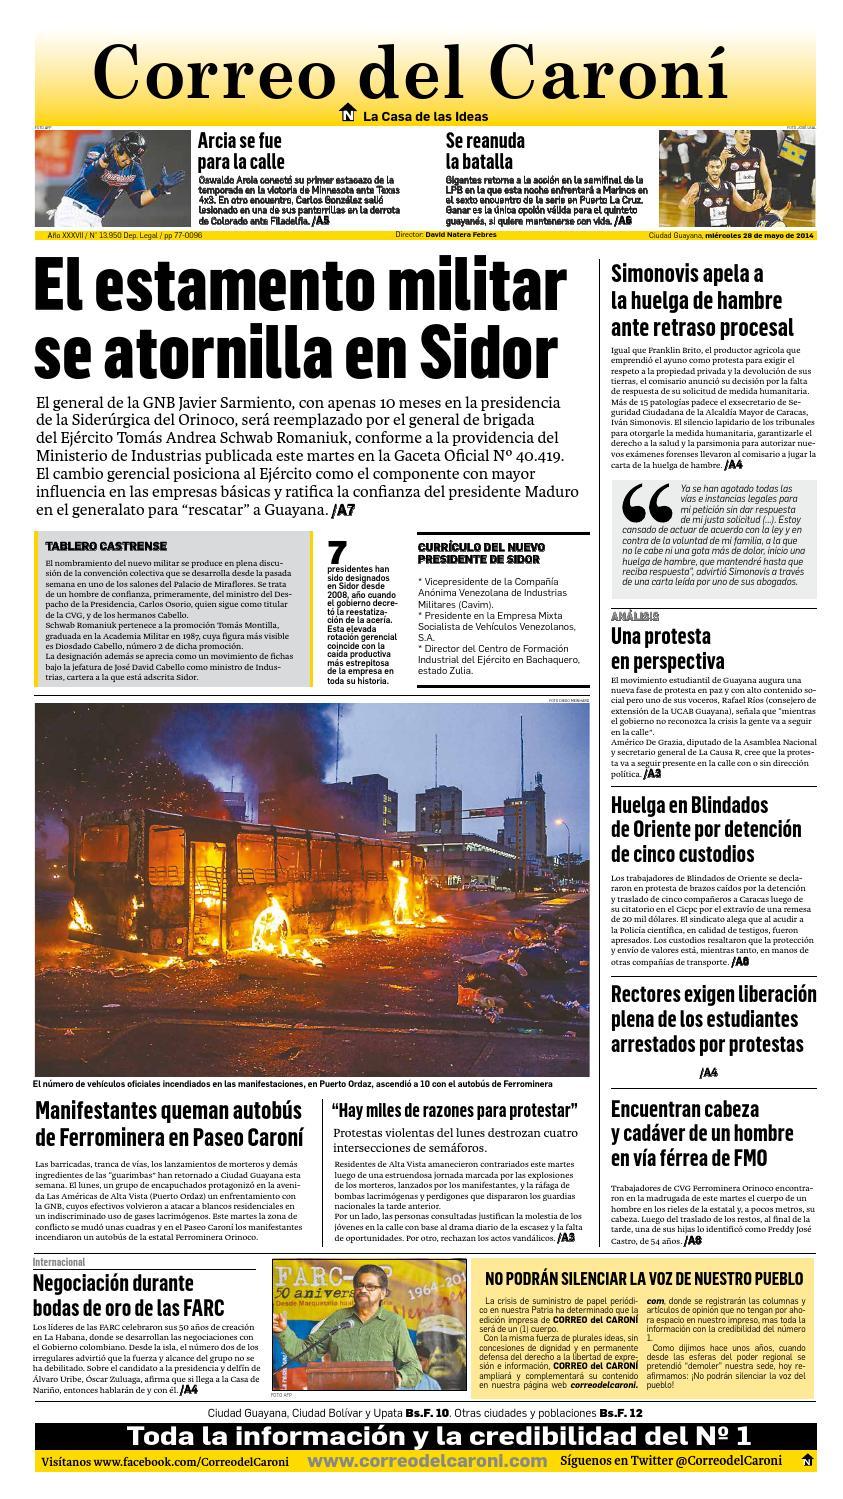 28 05 2014 by Correo del Caroní - issuu